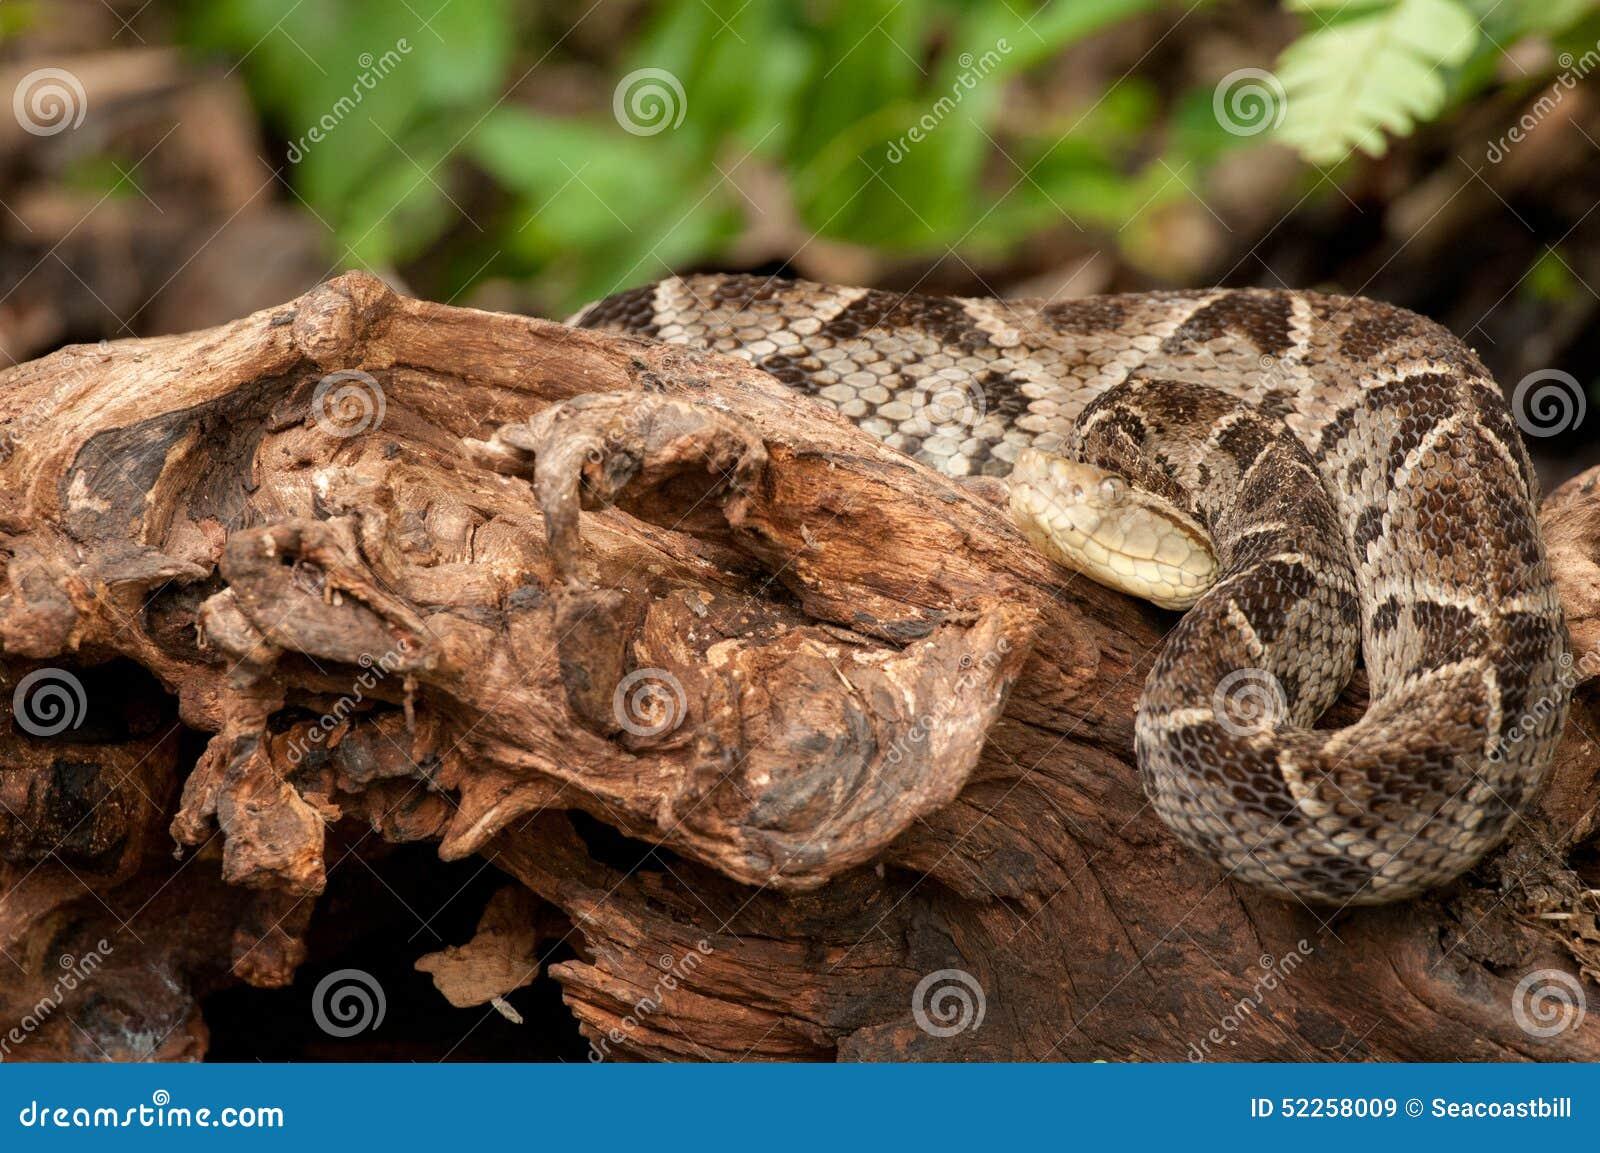 fer de lance costa rica venomous snake stock photo. Black Bedroom Furniture Sets. Home Design Ideas